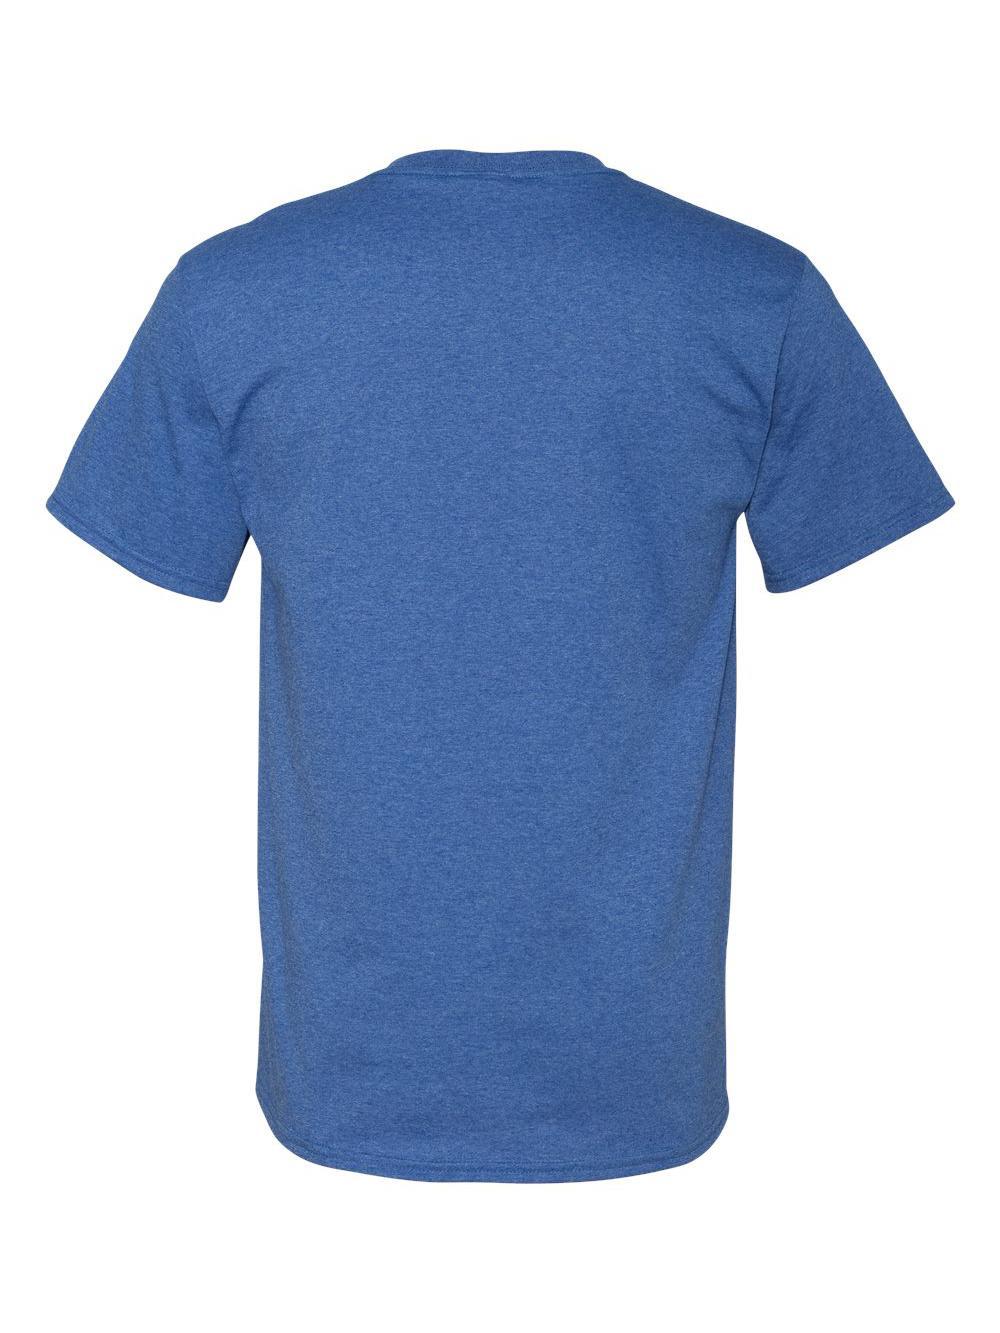 Fruit-of-the-Loom-HD-Cotton-Short-Sleeve-T-Shirt-3930R thumbnail 109